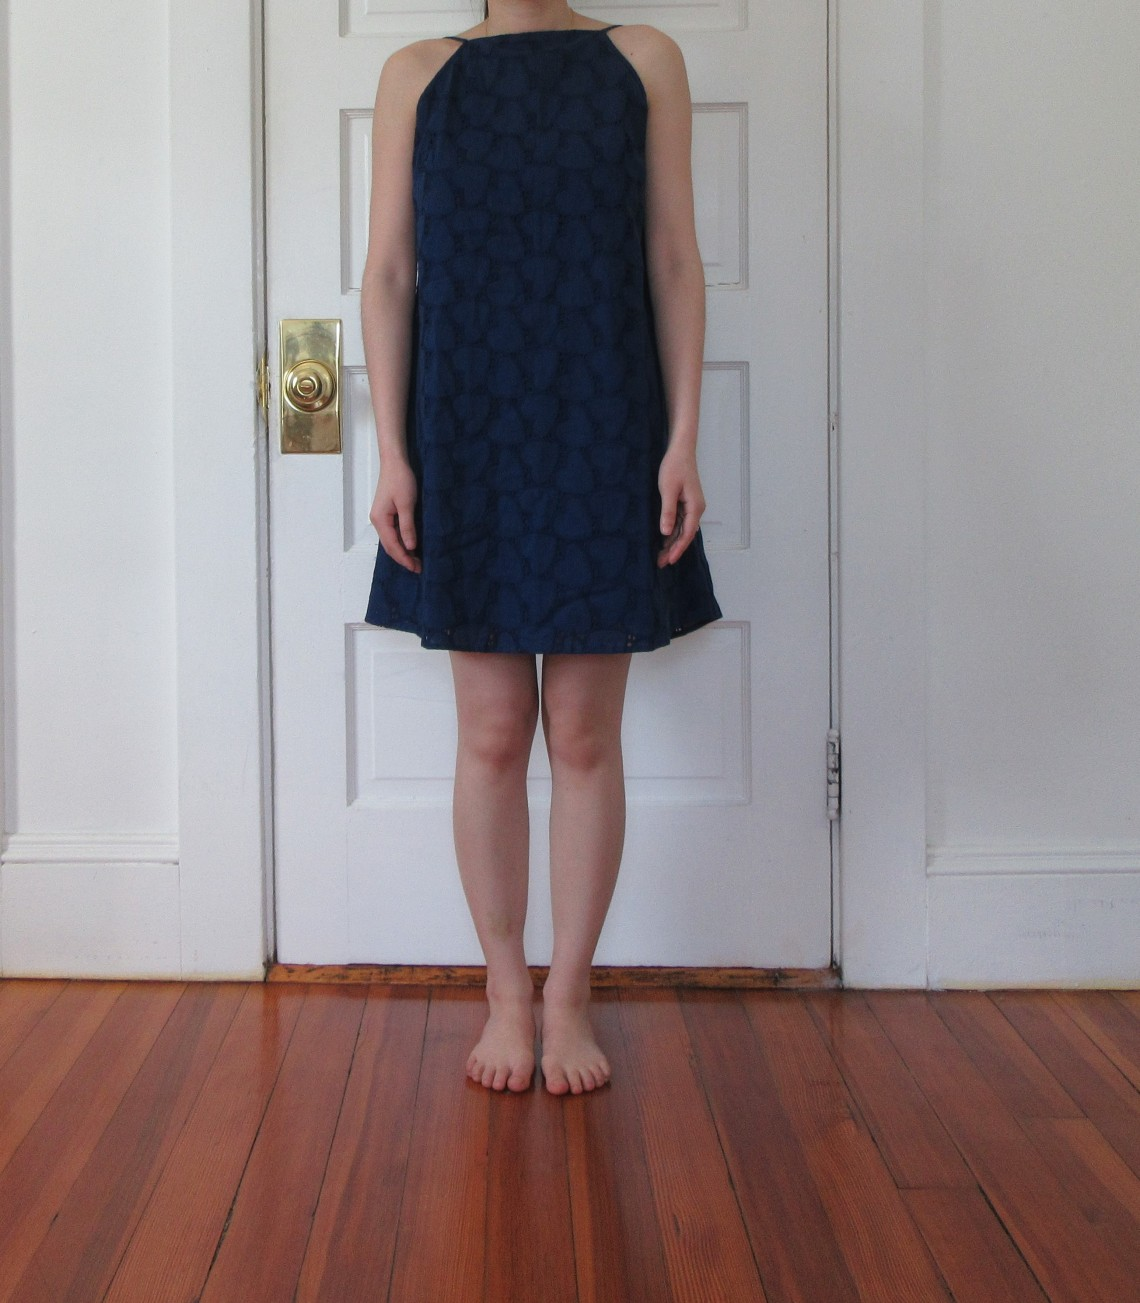 ASOS Haul: Summer Dresses & Body Suit